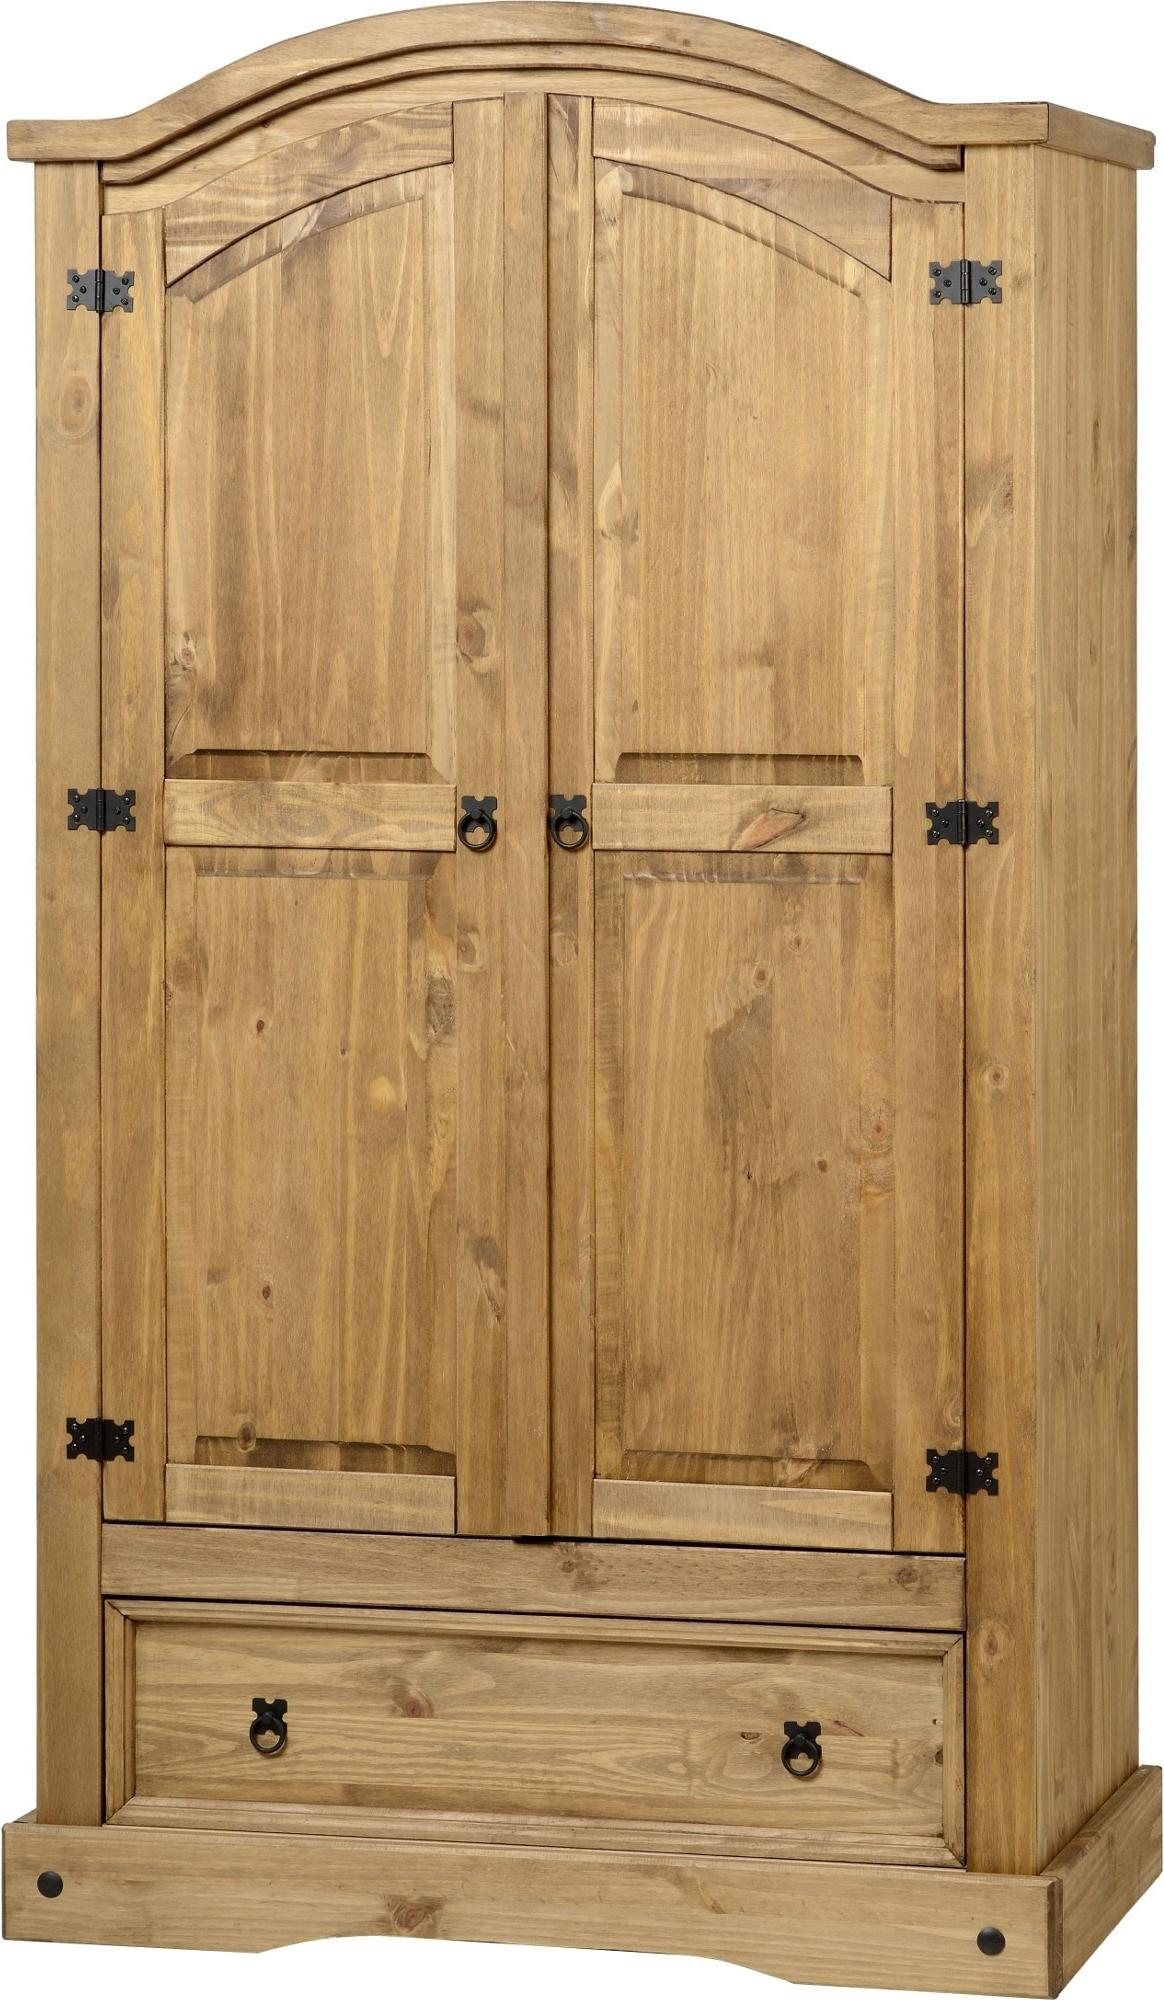 Corona Wardrobes With 3 Doors Inside Favorite Corona Pine 2 Door Wardrobe With Drawer – Default Store View (View 7 of 15)